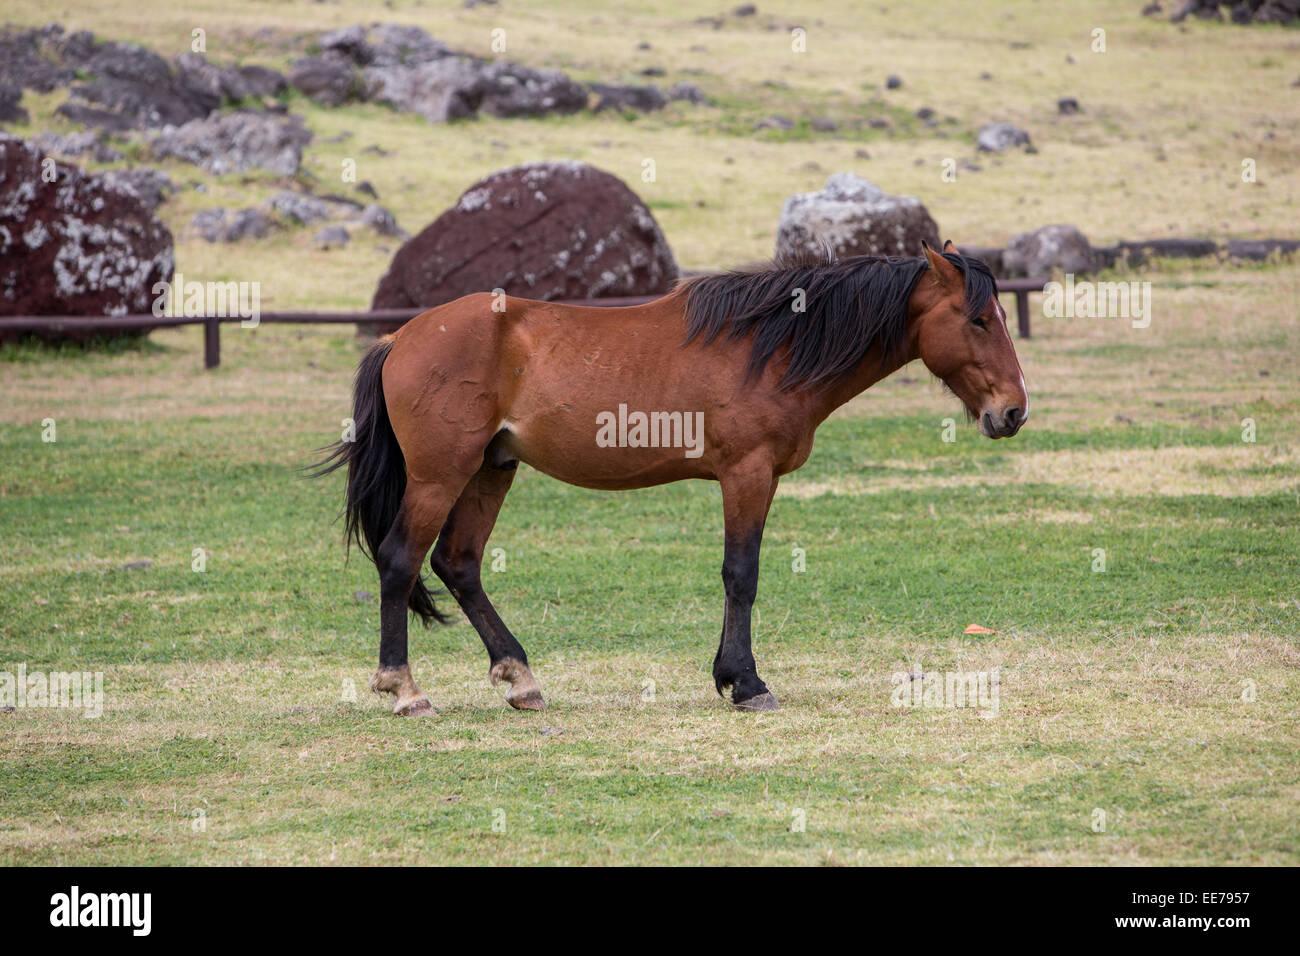 Wild horse on Easter Island - Stock Image